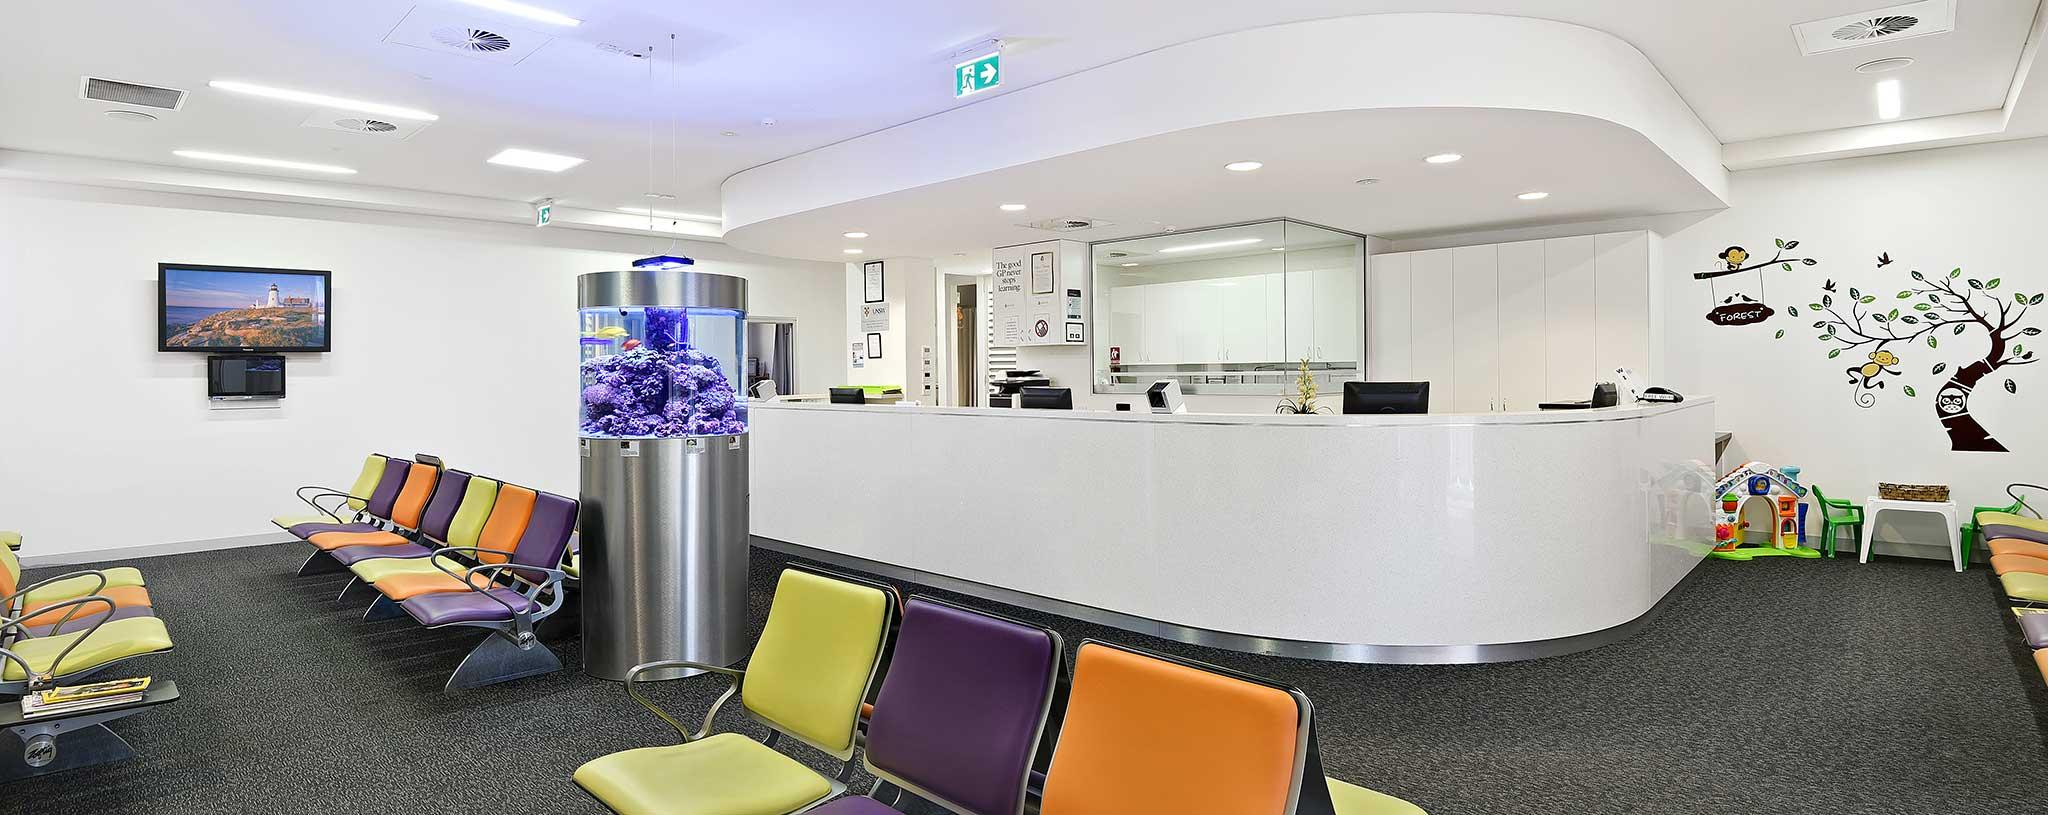 Greenmeadows Medical Centre Port Macquarie – We provide